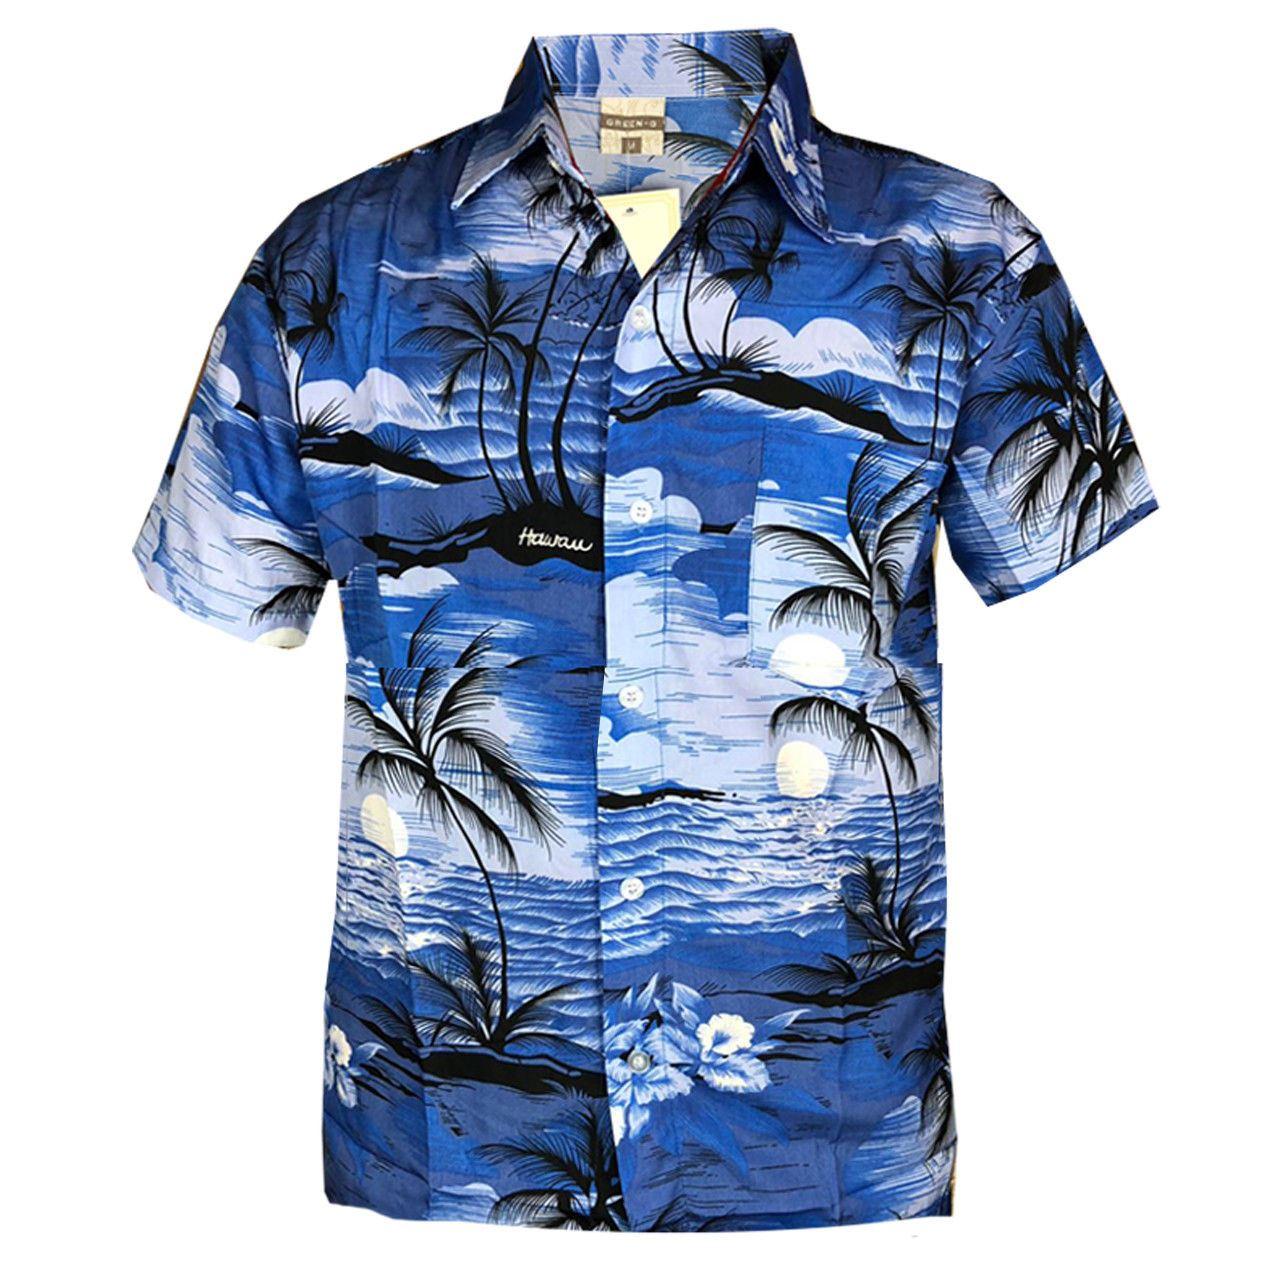 Mens-Hawaiian-Stag-Beach-Hawaii-Aloha-Party-Summer-Holiday-Casual-Fancy-Shirt thumbnail 4